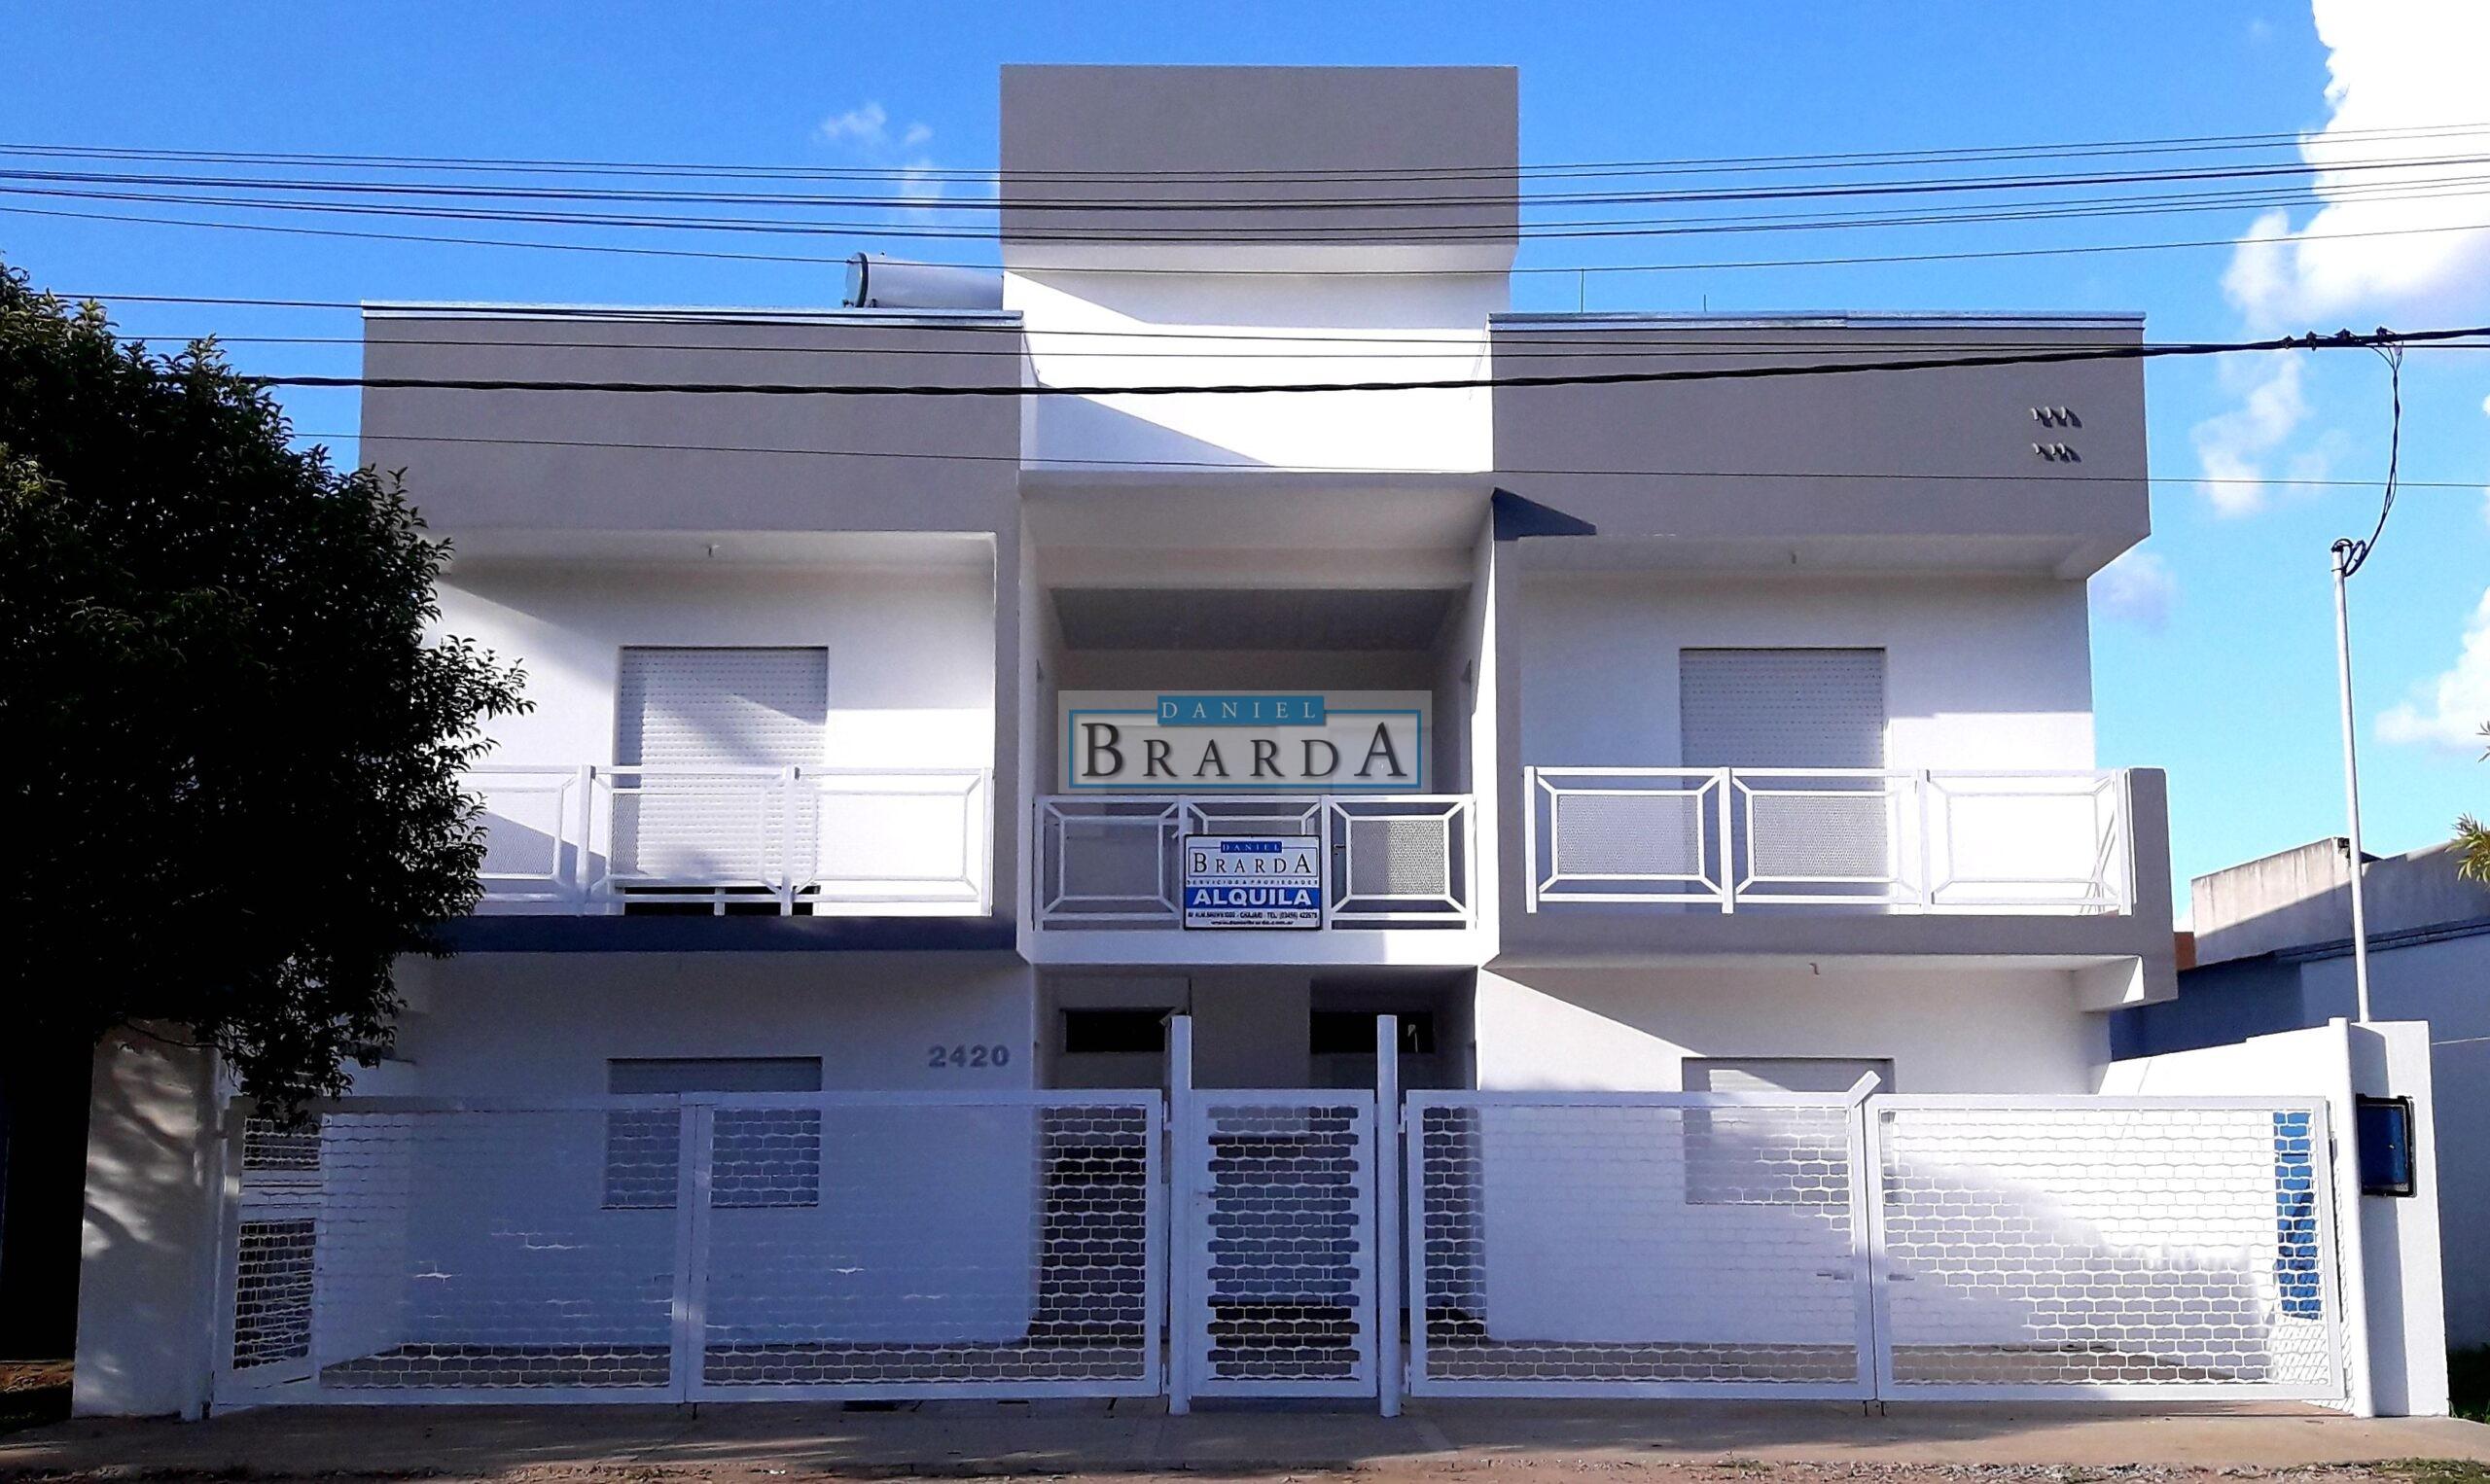 Departamento 5 (1 dormitorio) – Alte. Brown 2420 Chajari (ER)